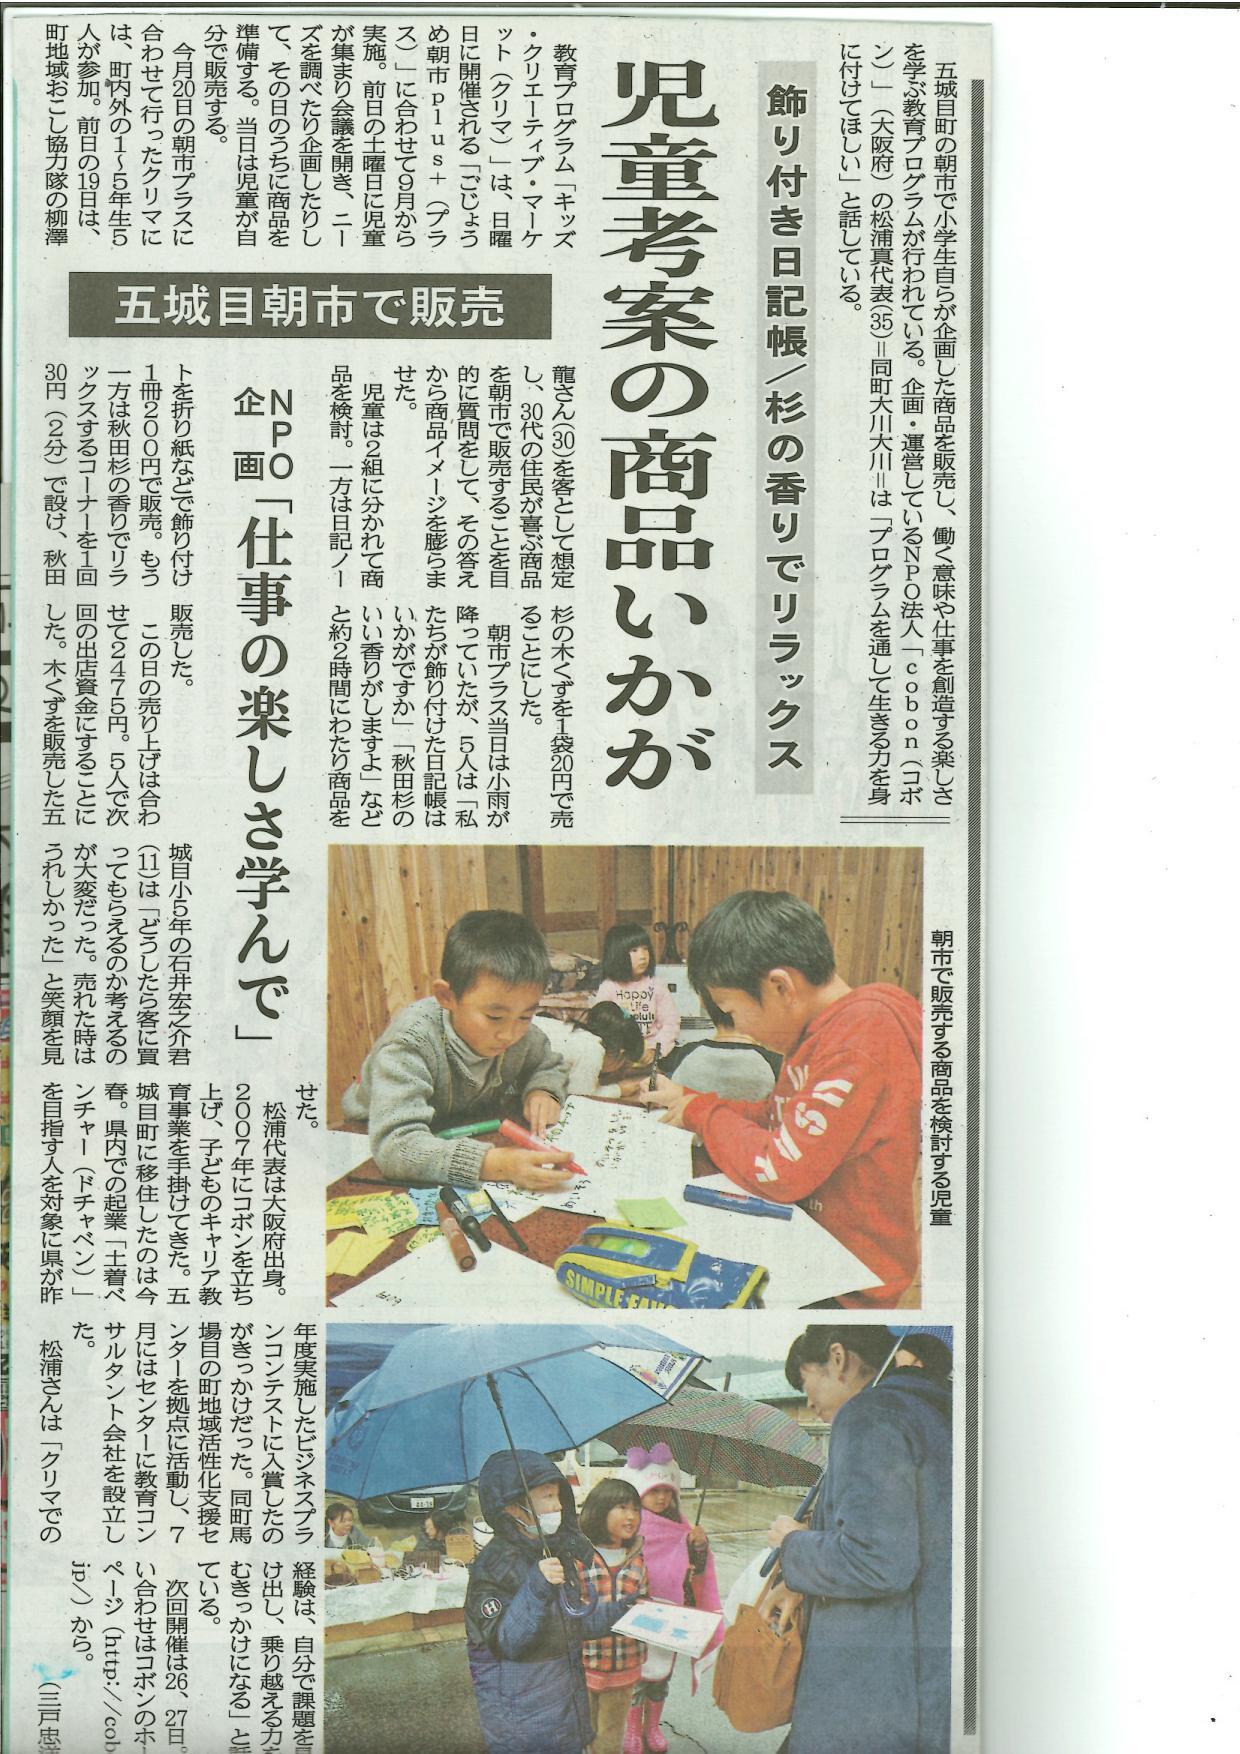 http://www.cobon.jp/news/Image161125115757_01.jpg